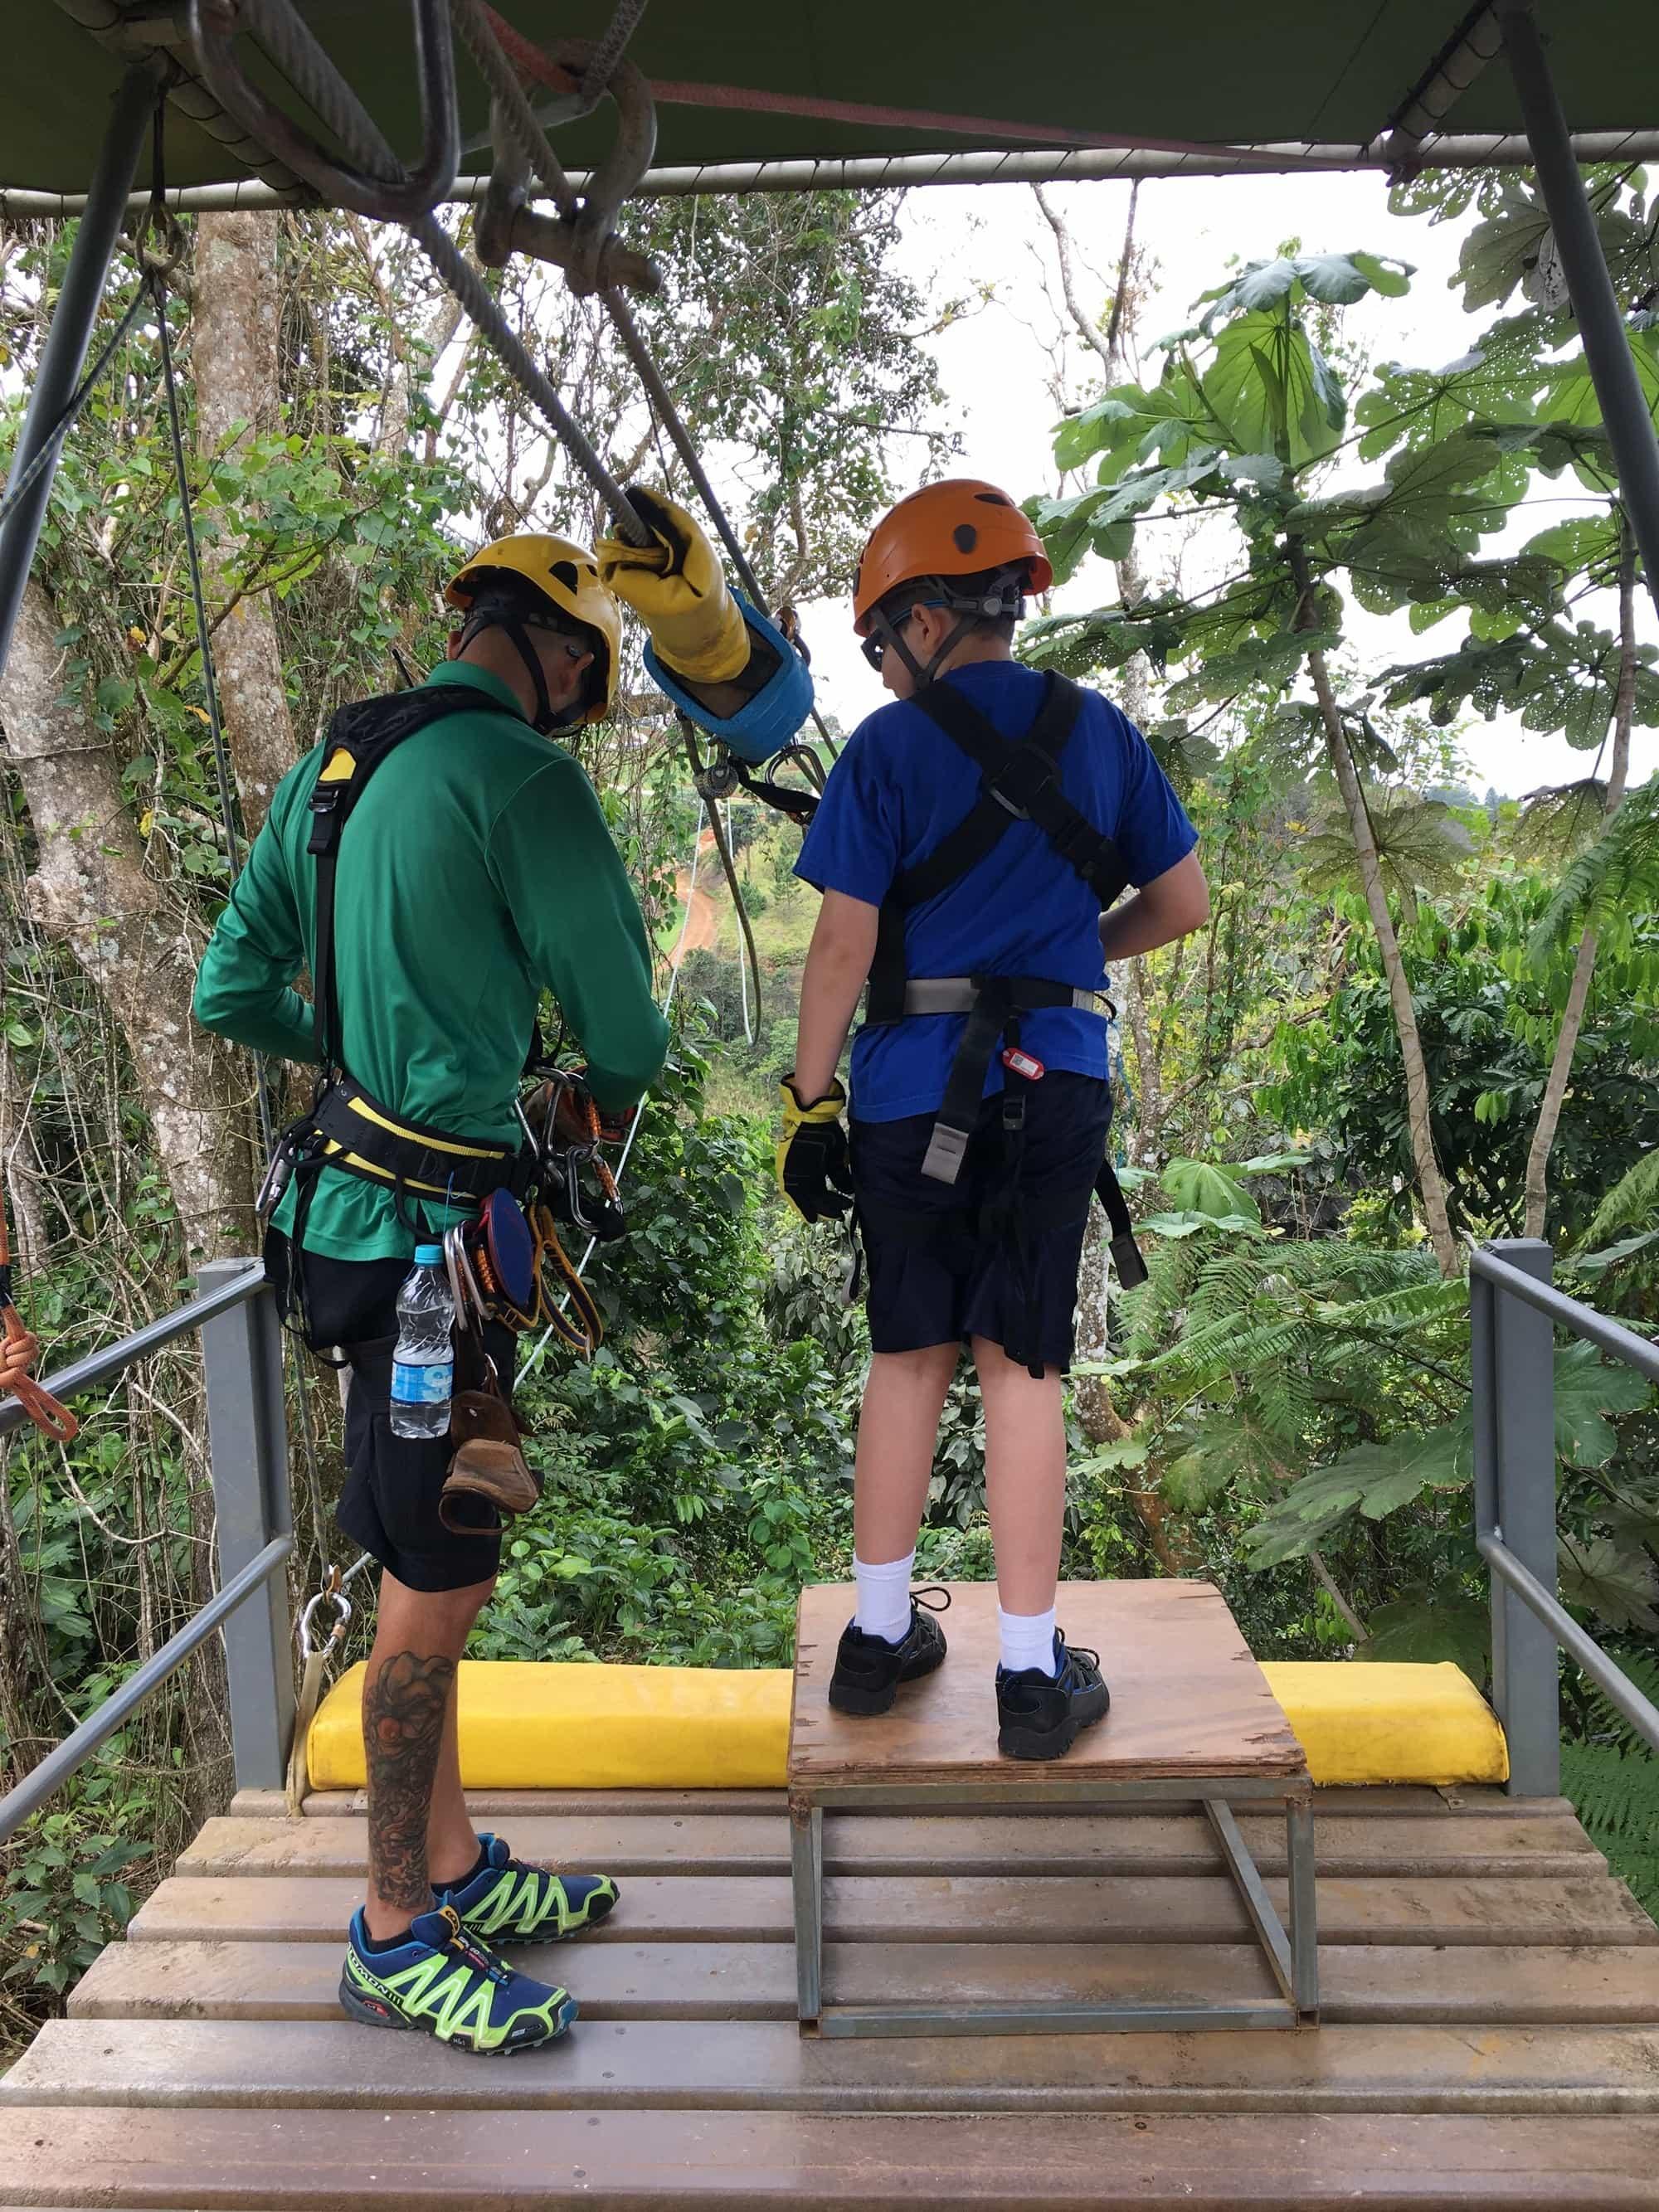 Toroverde Adventure Park in Puerto Rico